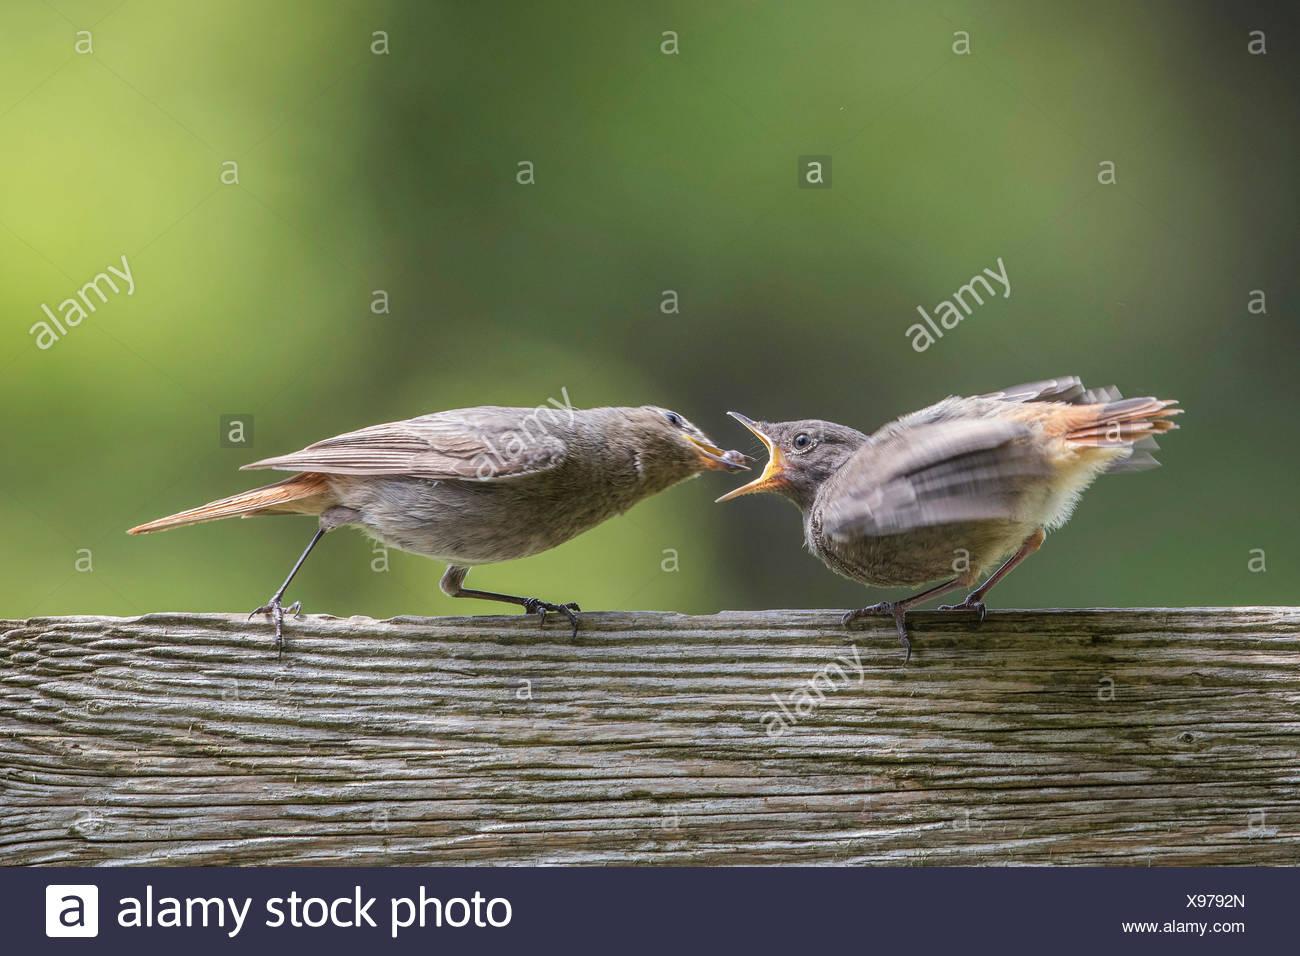 Hausrotschwanz, Haus-Rotschwanz (Phoenicurus ochruros), Weibchen fuettert bettelnden flueggen Jungvogel mit einer Kugelassel, De - Stock Image